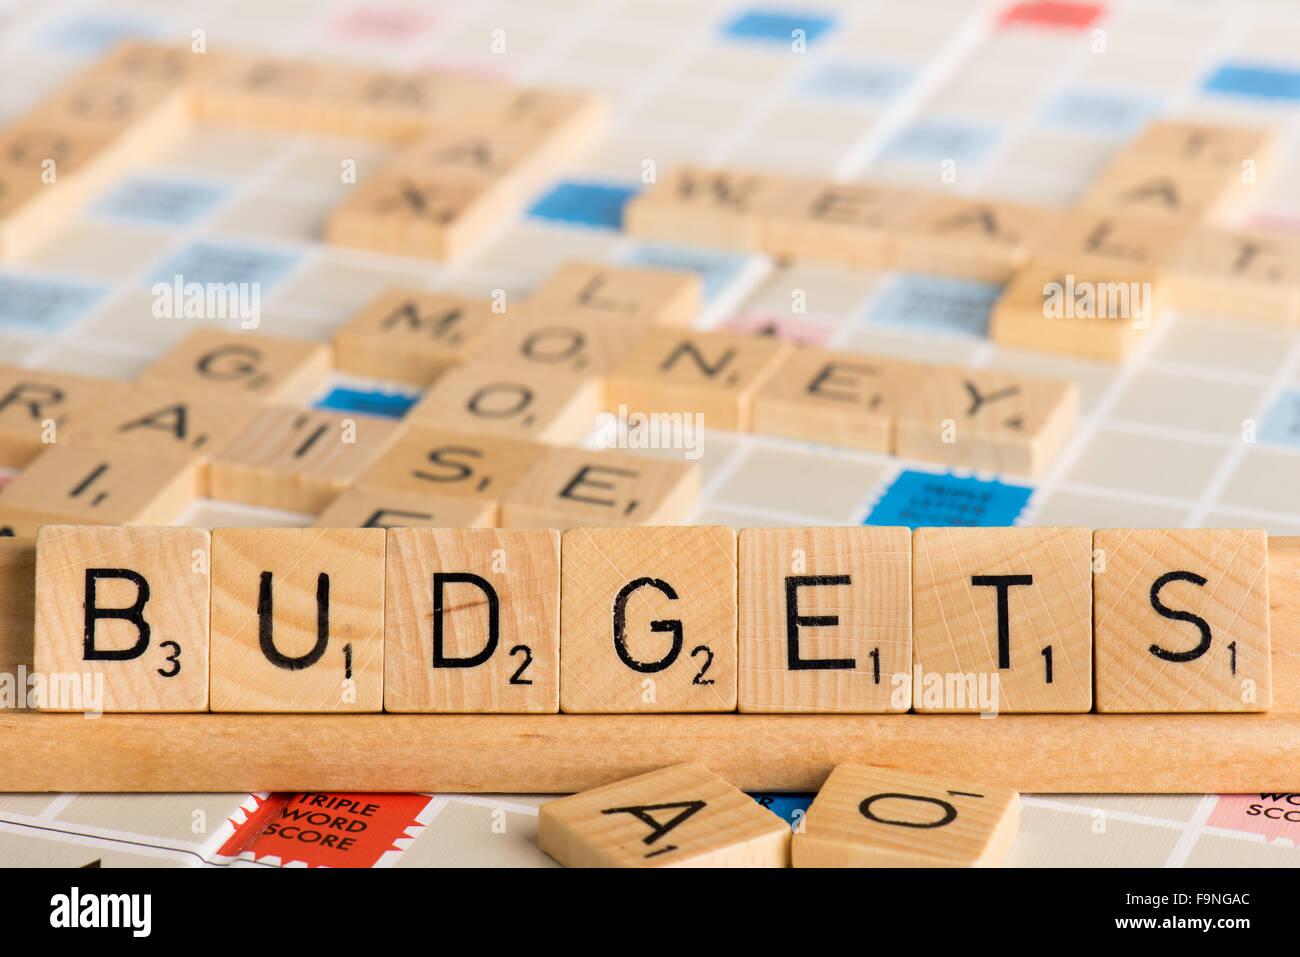 Scrabble - BUDGETS - Stock Image